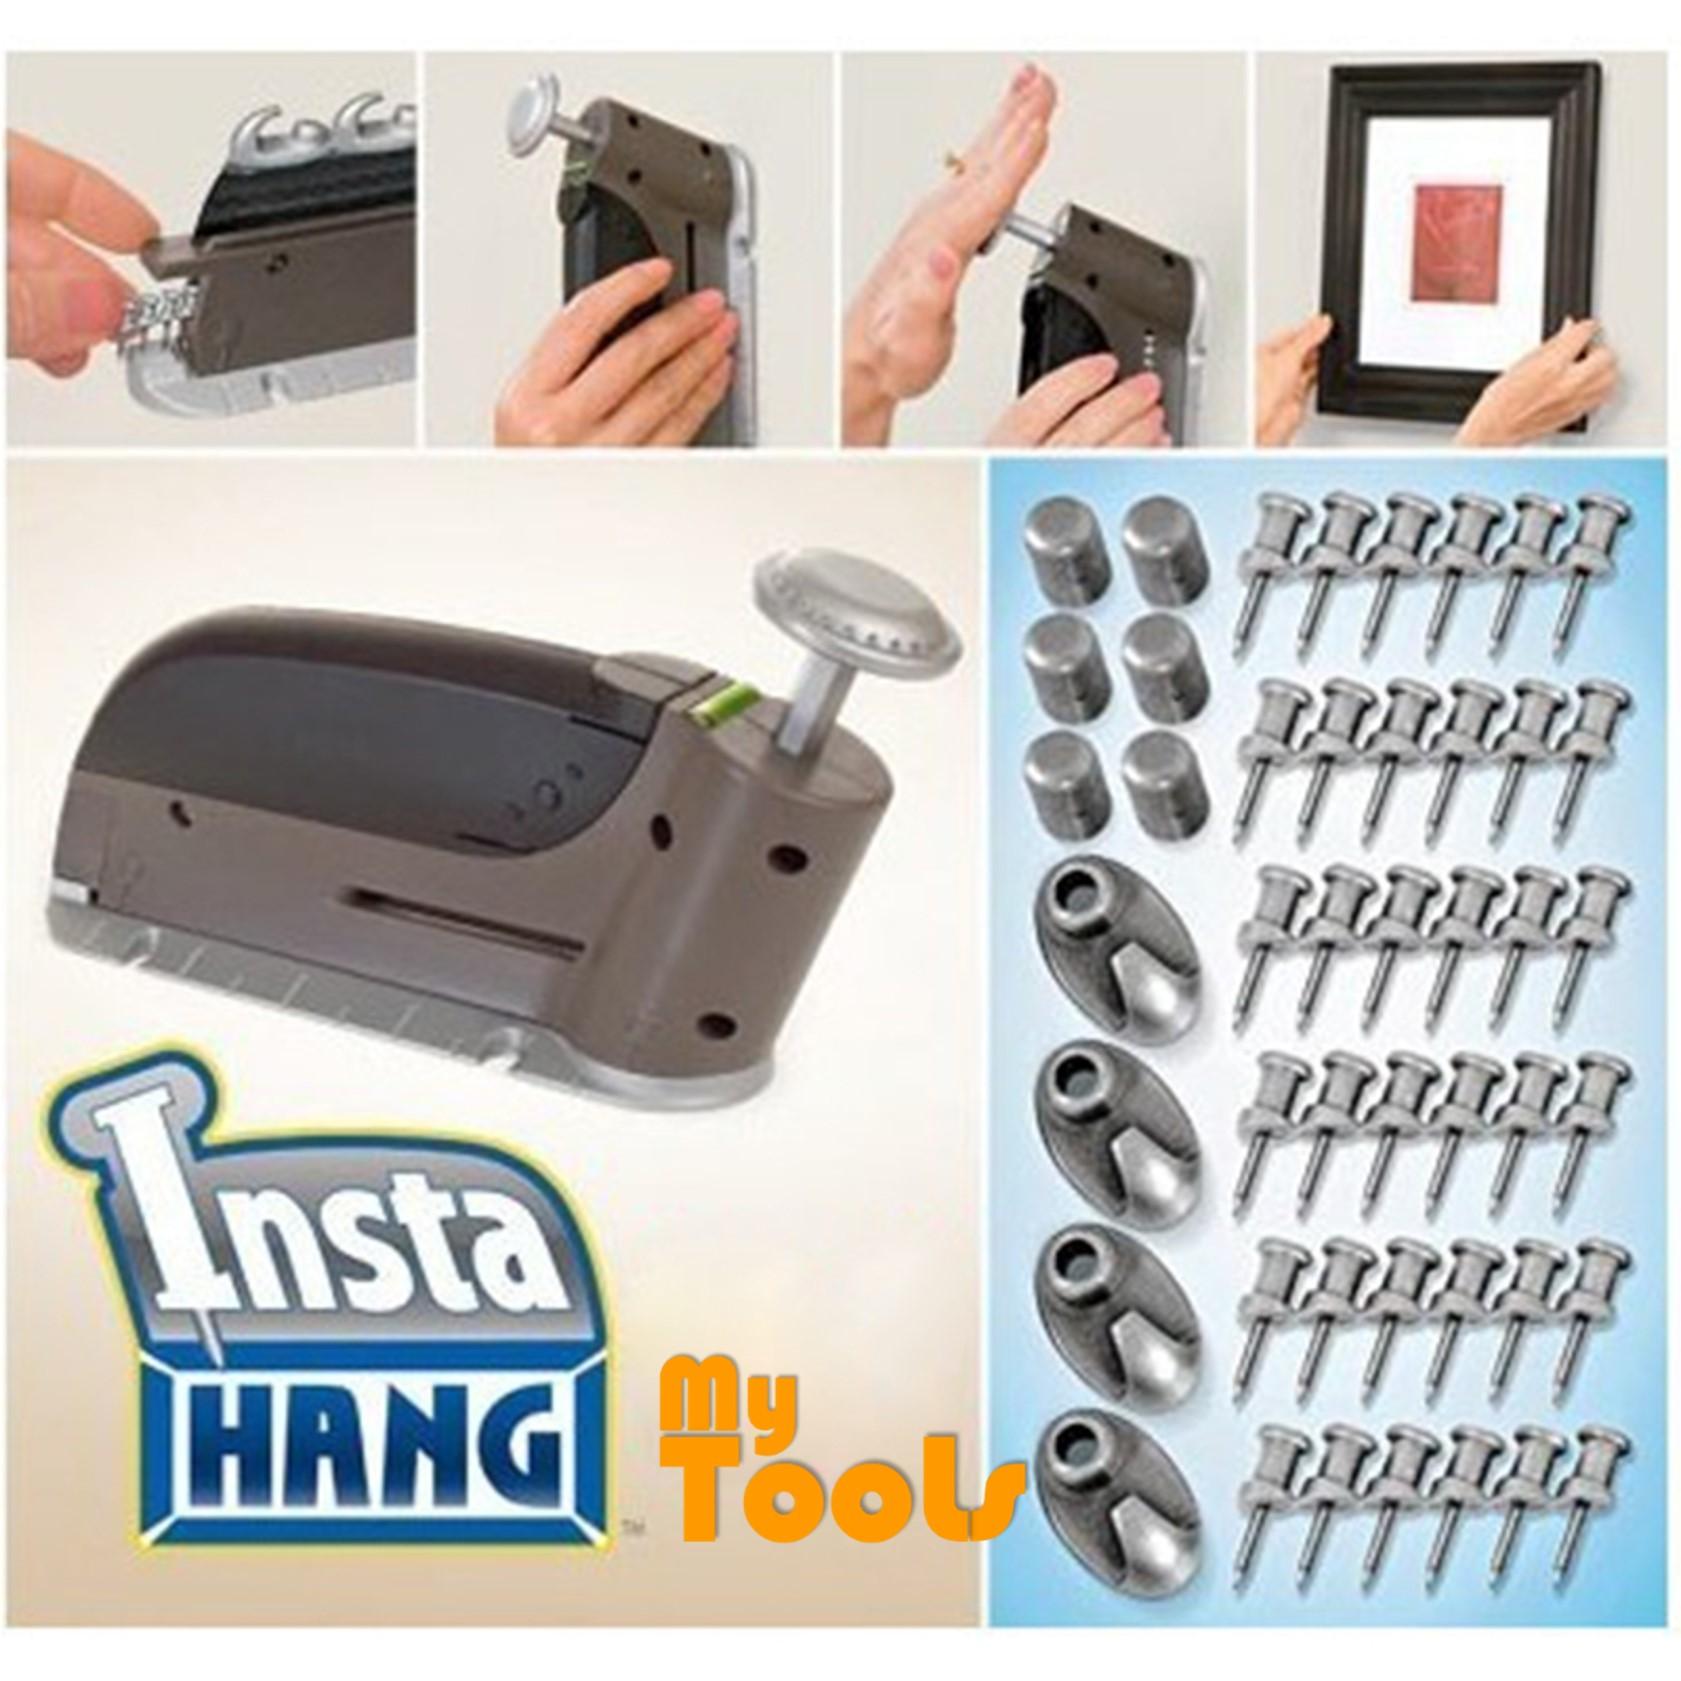 Mytools Insta Hang Wall Hook Drywall Hangers DIY Tools 47 Pcs